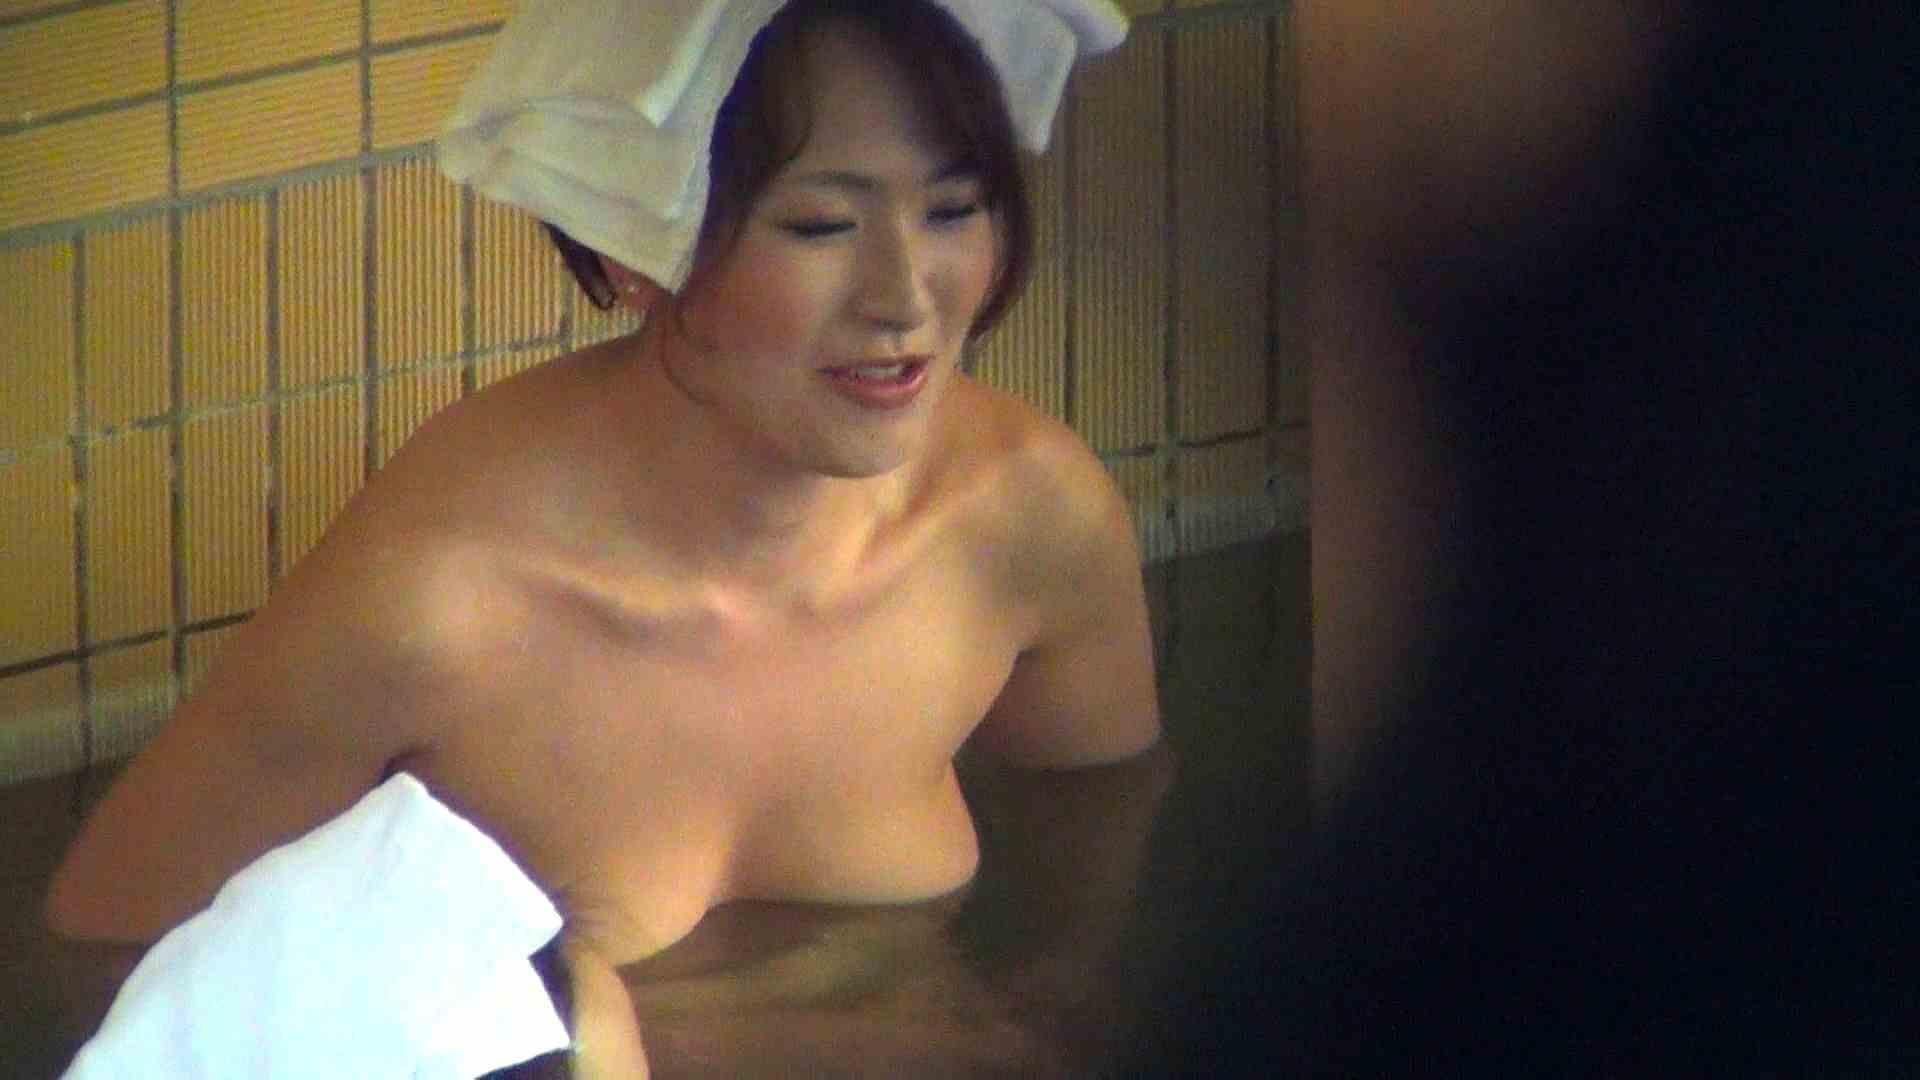 Aquaな露天風呂Vol.272 盗撮 われめAV動画紹介 99PICs 86